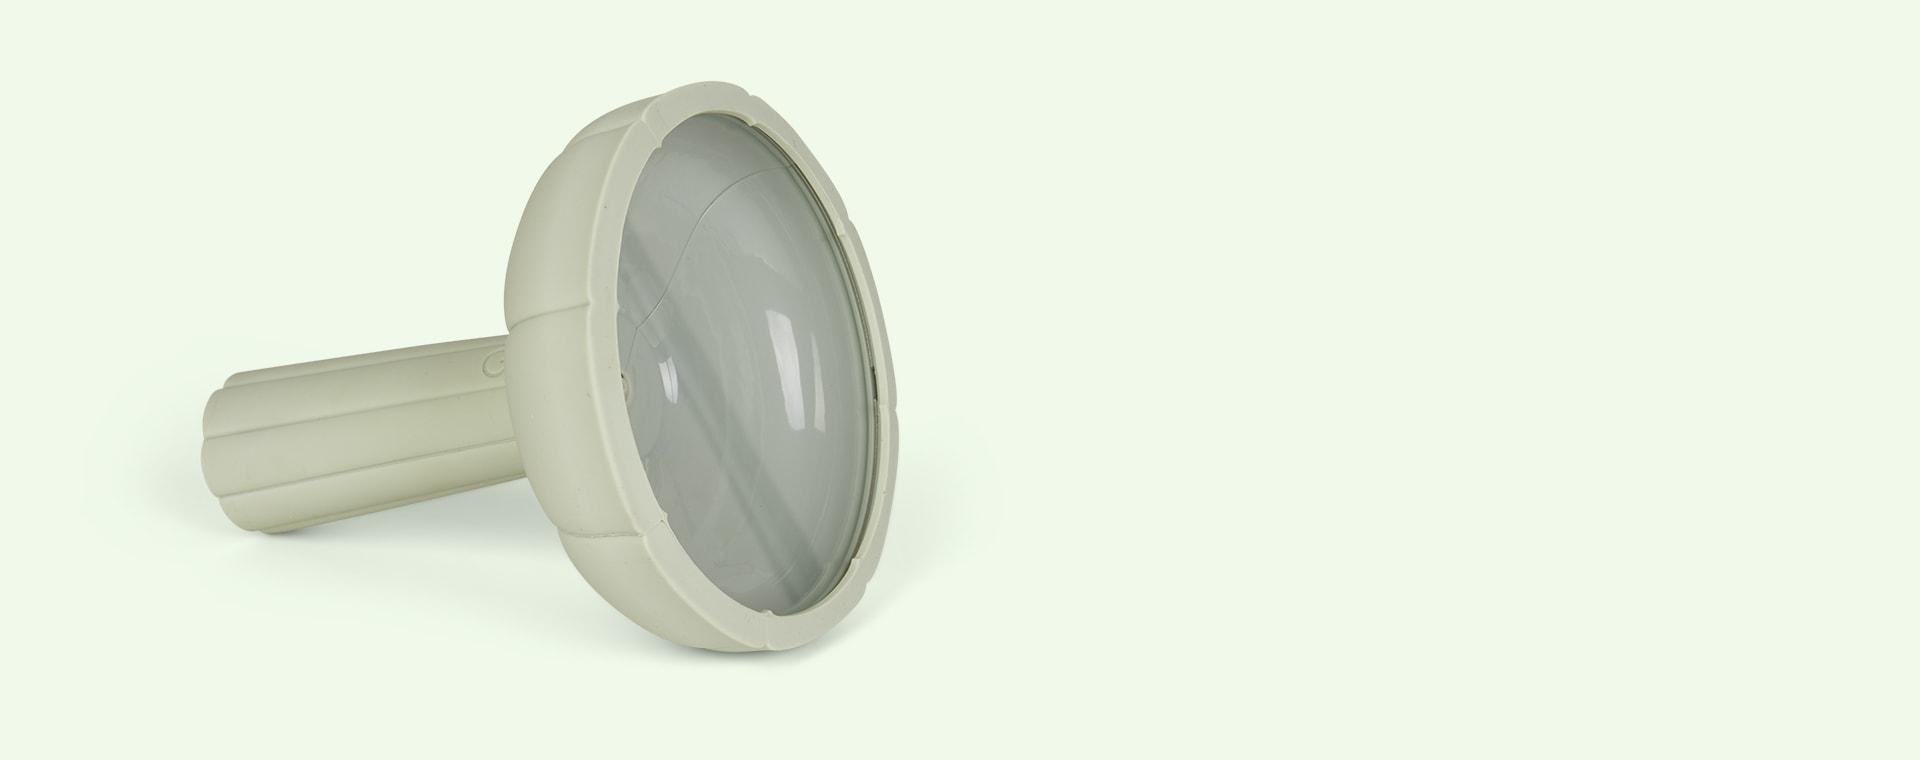 Mint Blafre Magical LED Nightlight